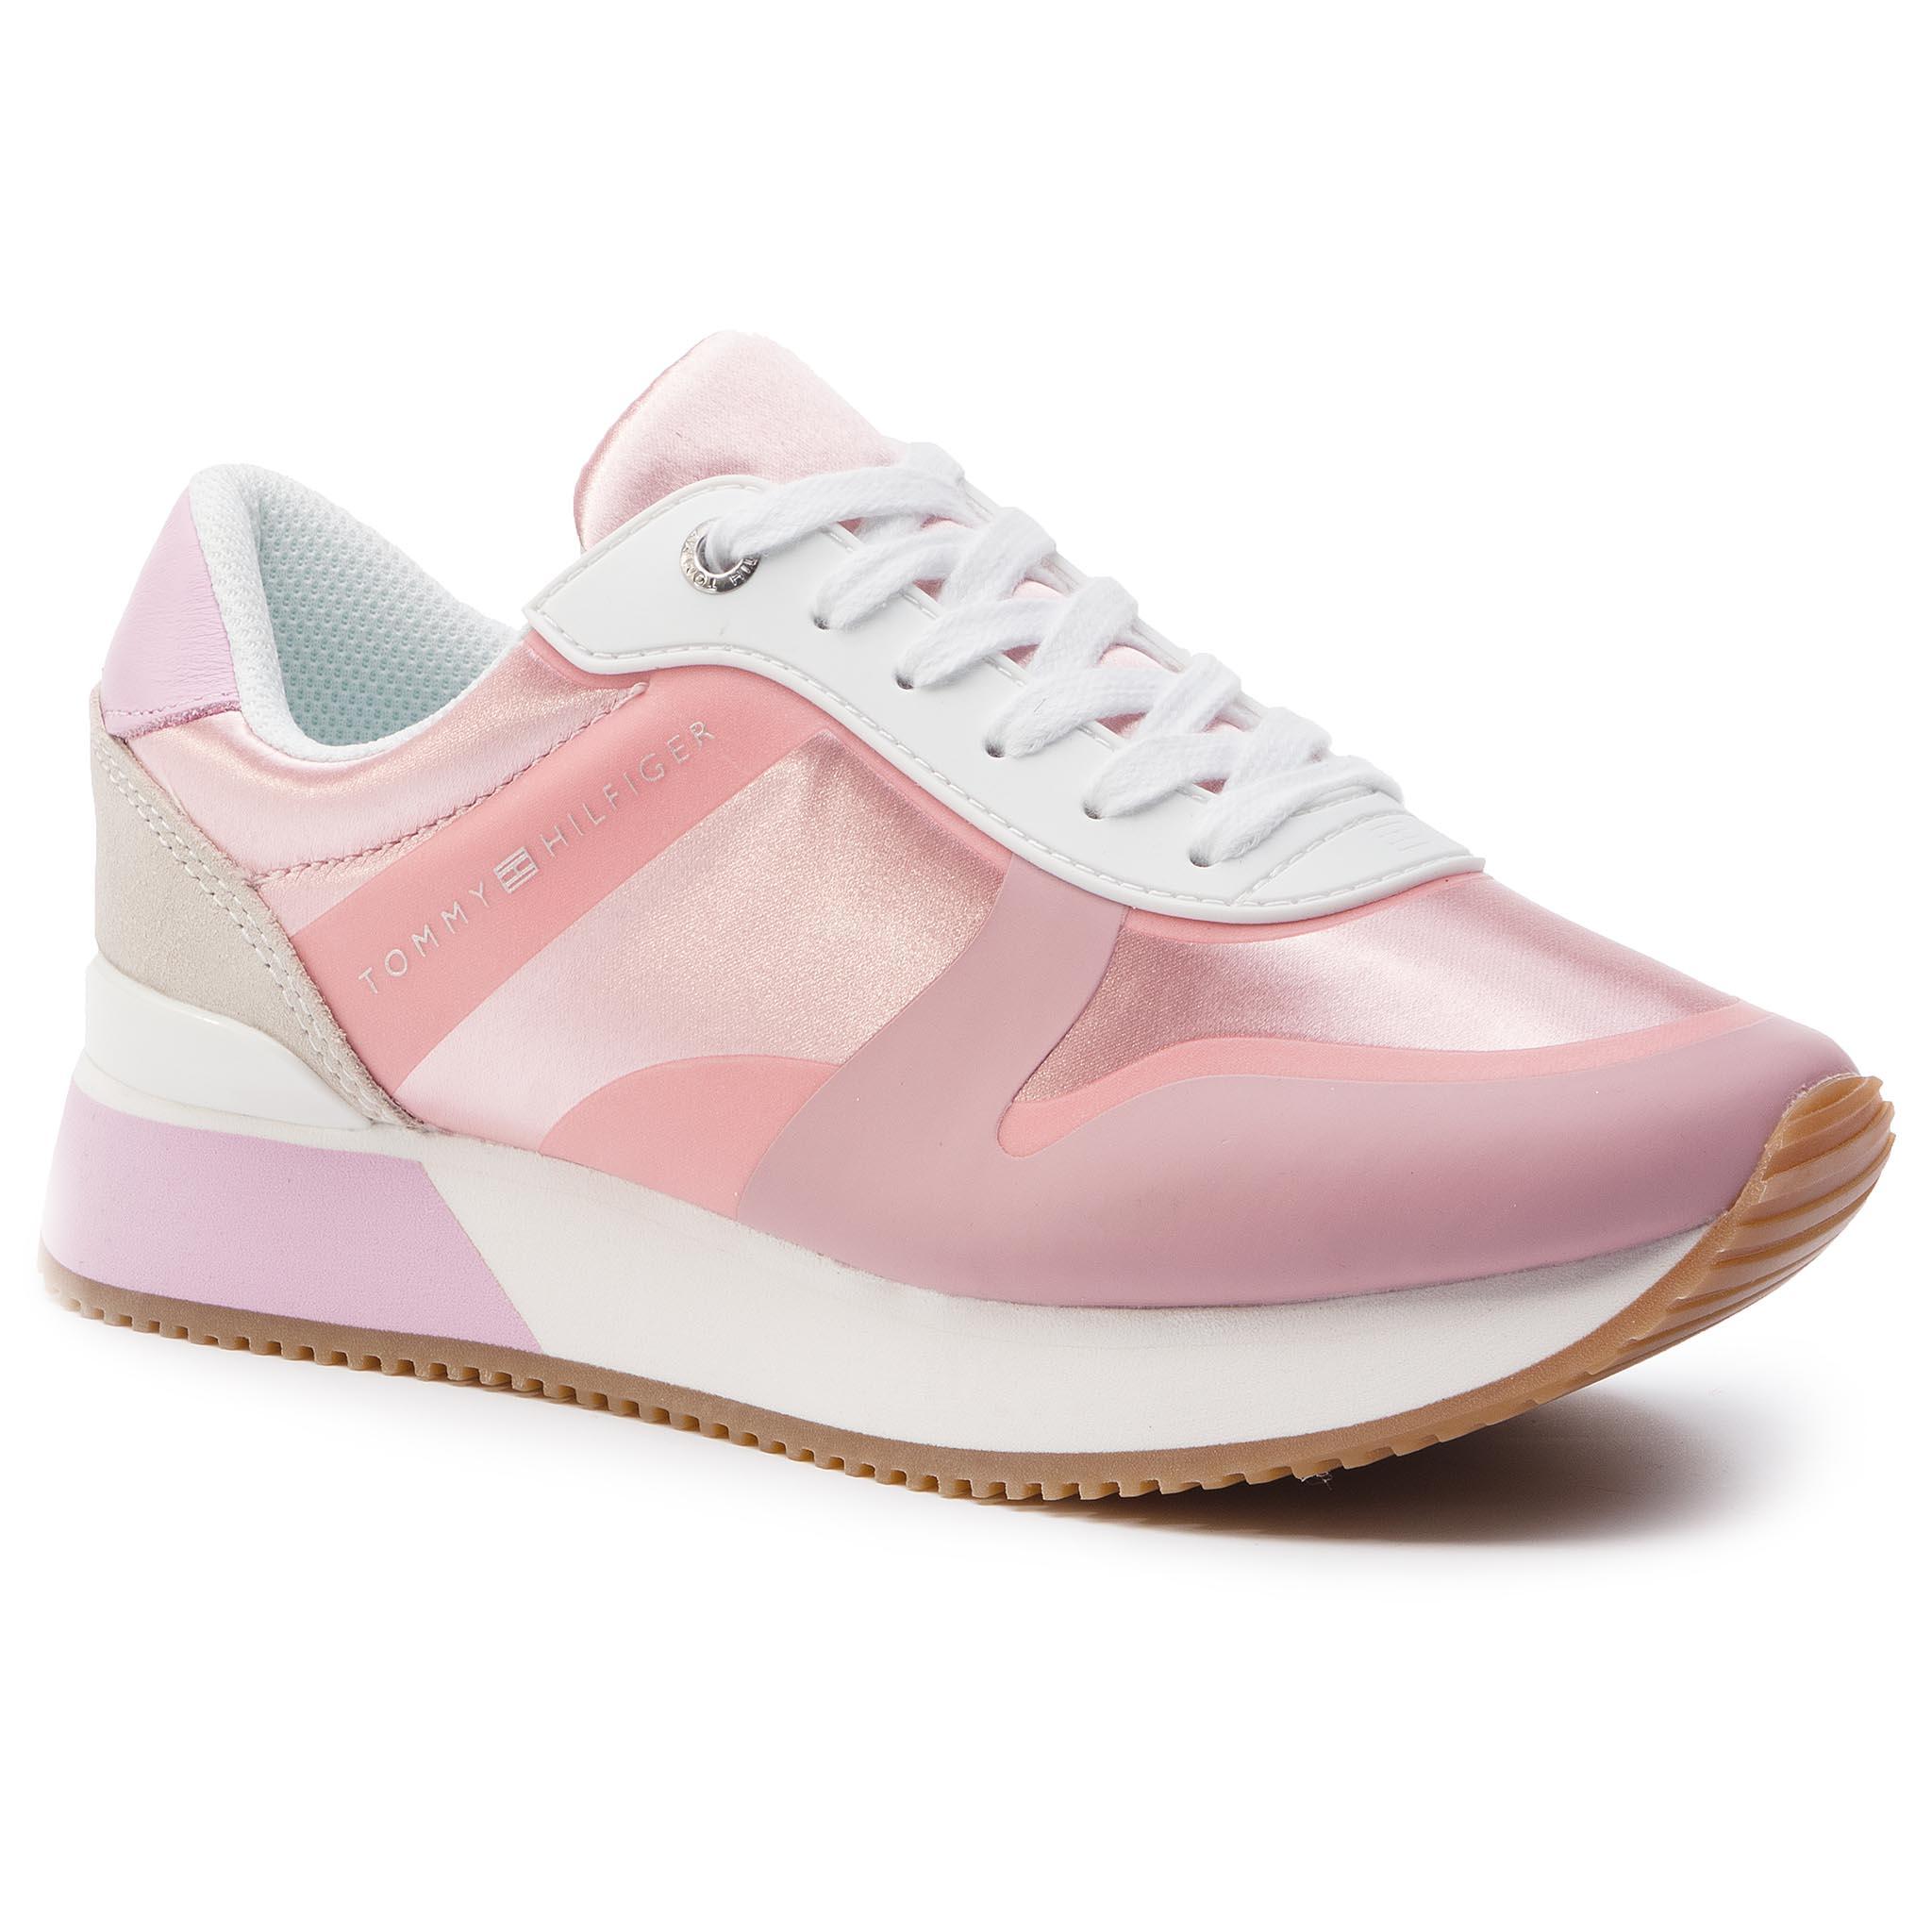 bb0efb75ac Sportcipő TOMMY HILFIGER - Pop Color Satin City Sneaker FW0FW04099 Pink  Lavender 518